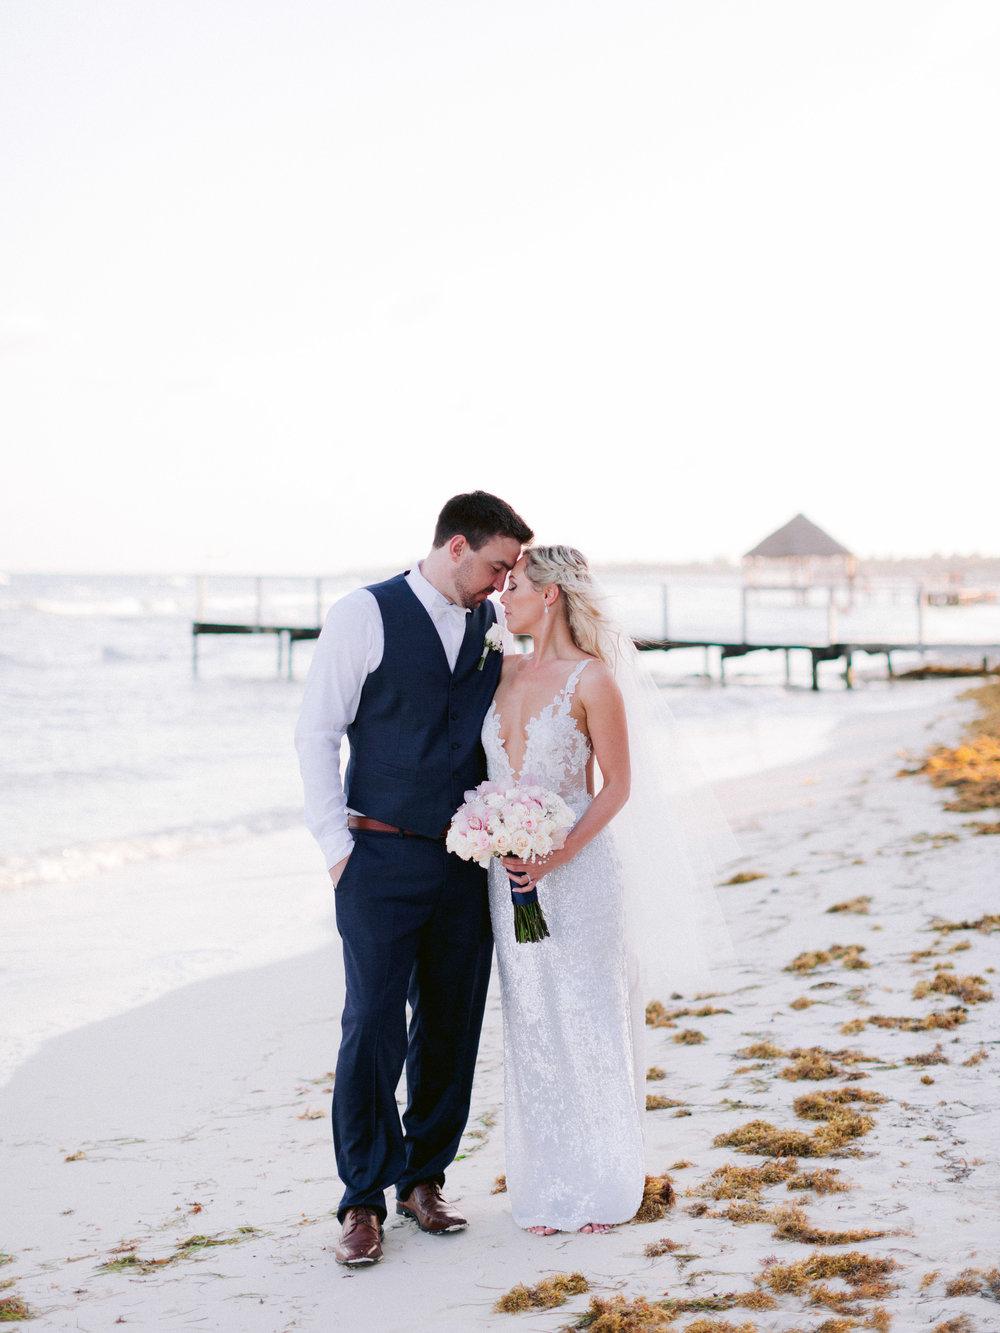 Kim_Jeff_Cancun Wedding_Portraits_Kurtz_Orpia (116 of 178).jpg